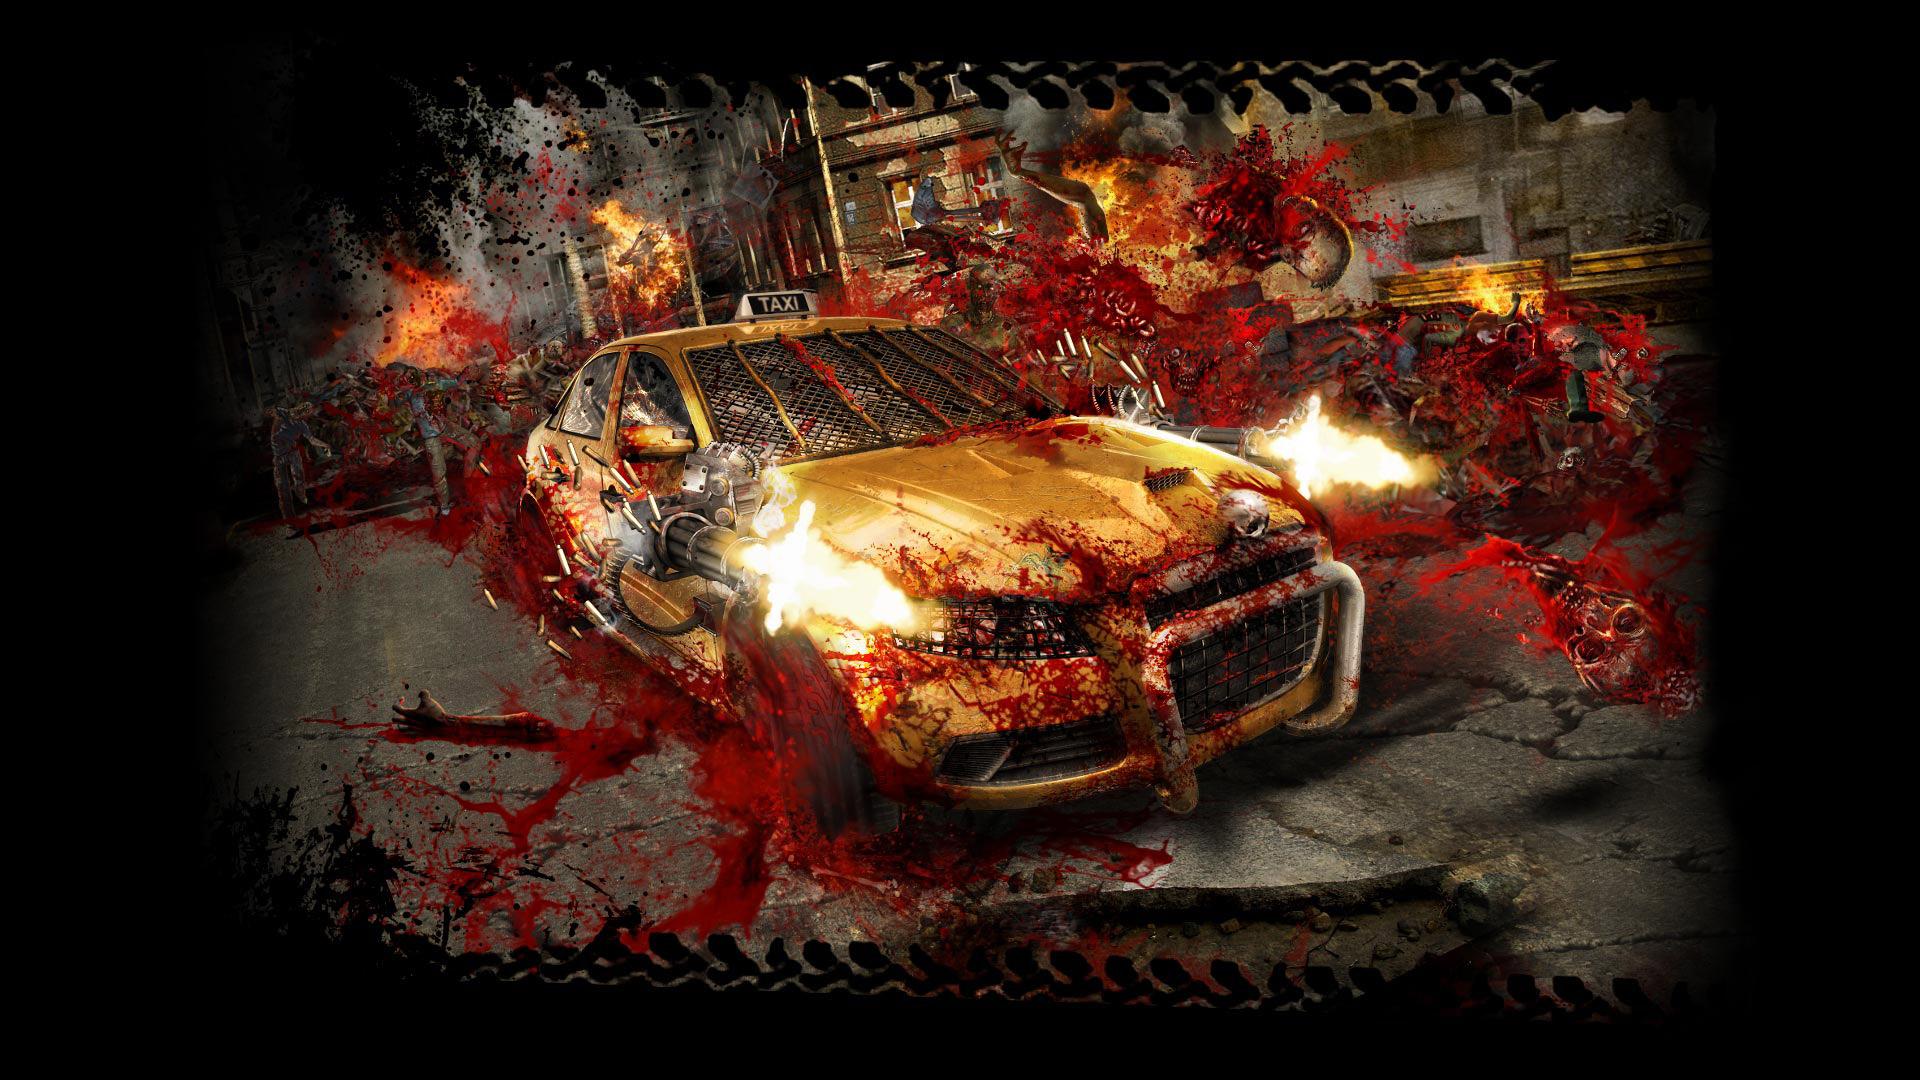 Zombie Driver Wallpaper in 1920x1080